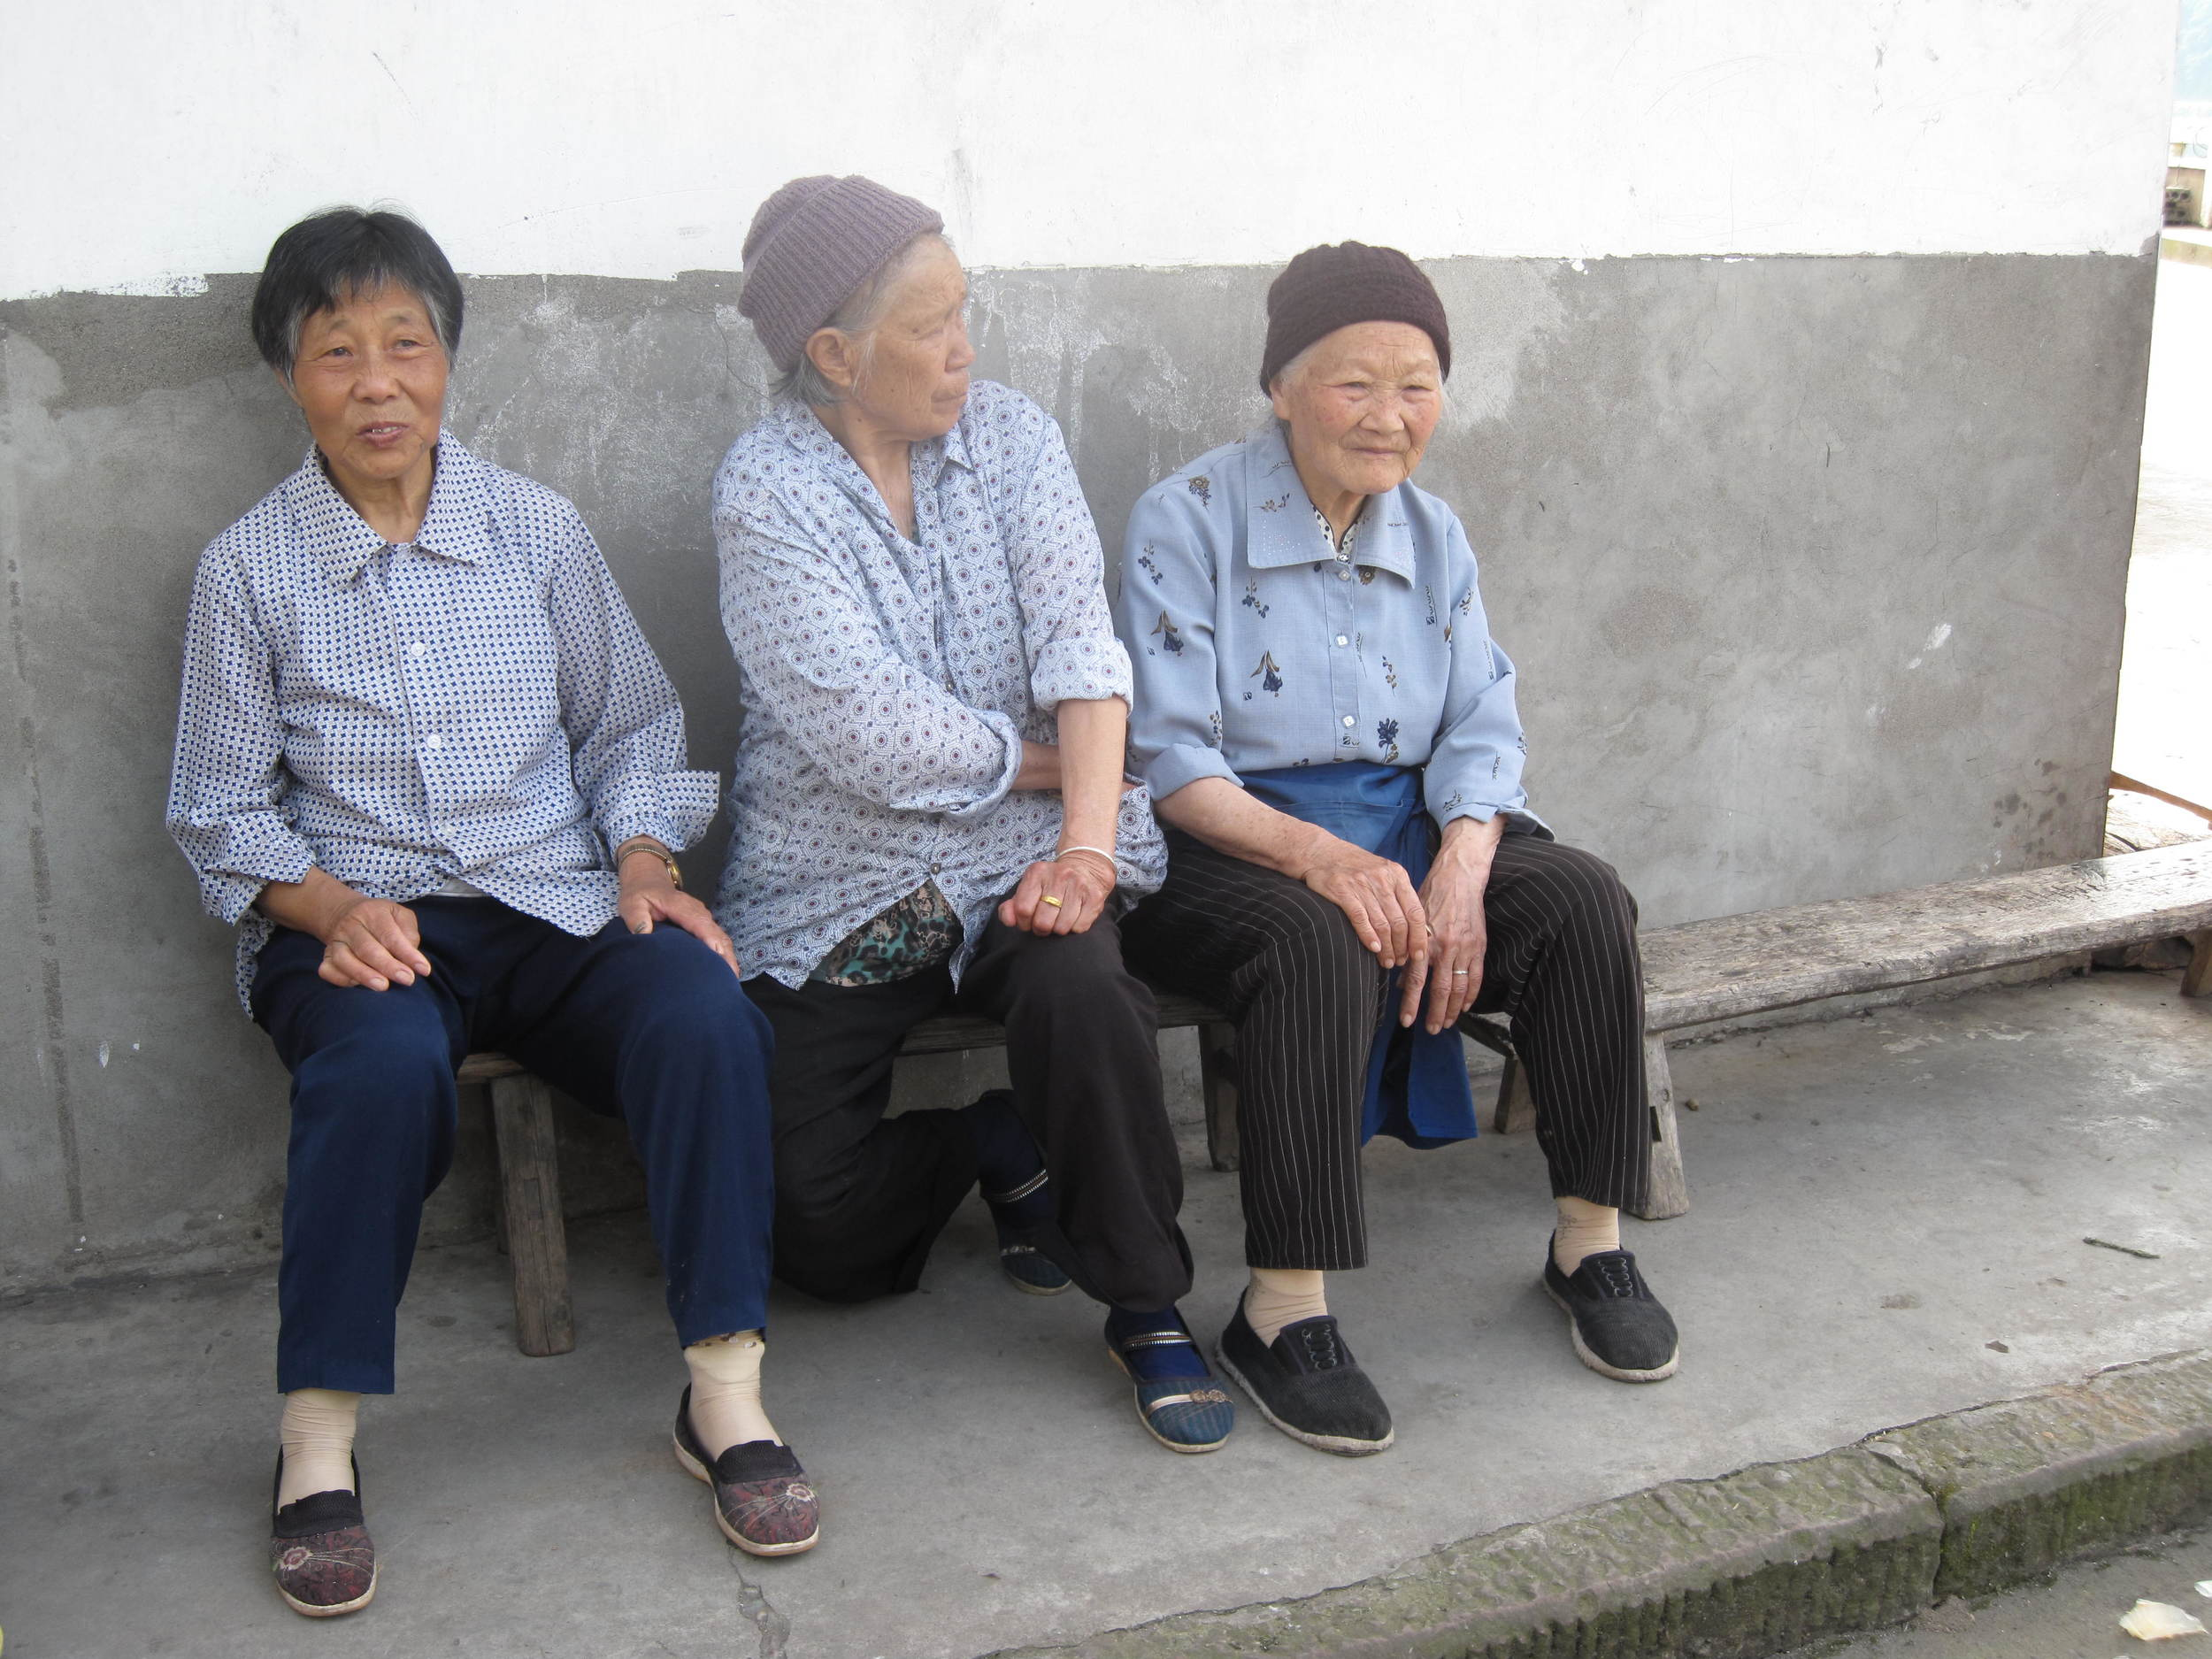 village audience